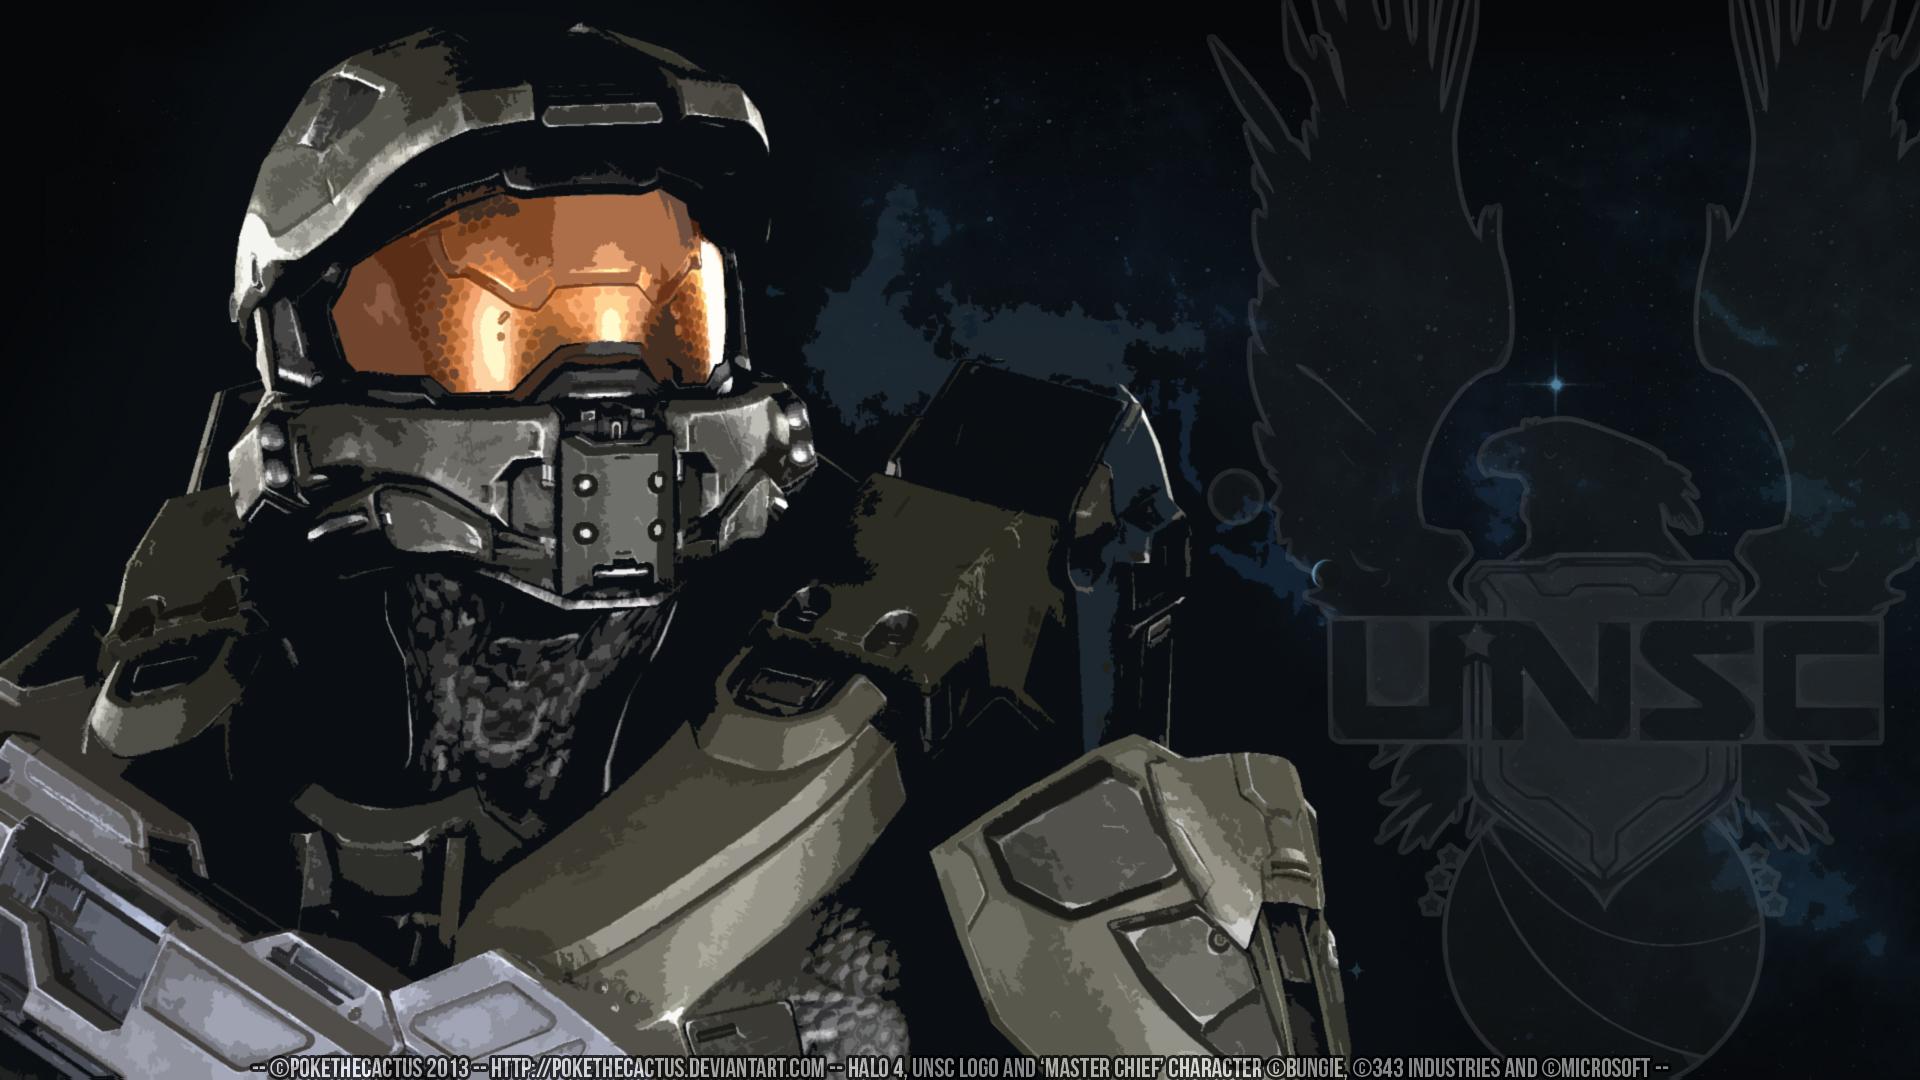 Halo Master Chief Wallpaper - WallpaperSafari